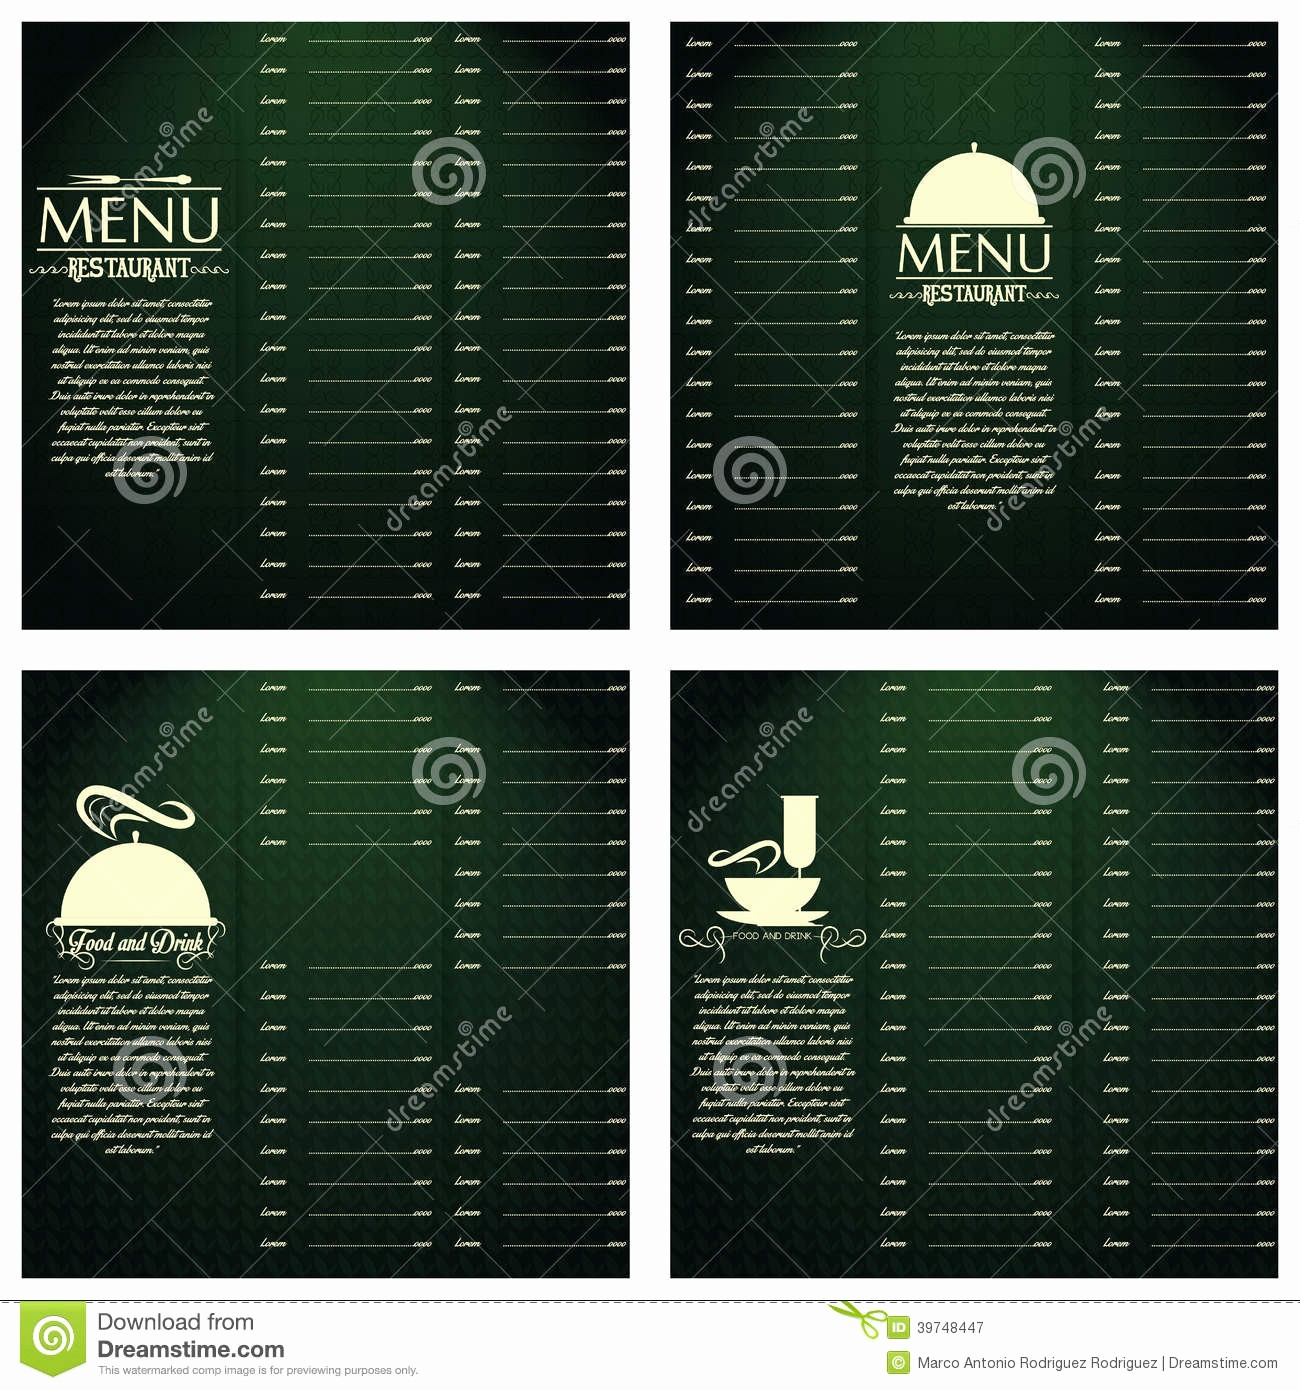 Free Editable Restaurant Menu Templates Unique Restaurant Menu Cards Design Template Editable Stock